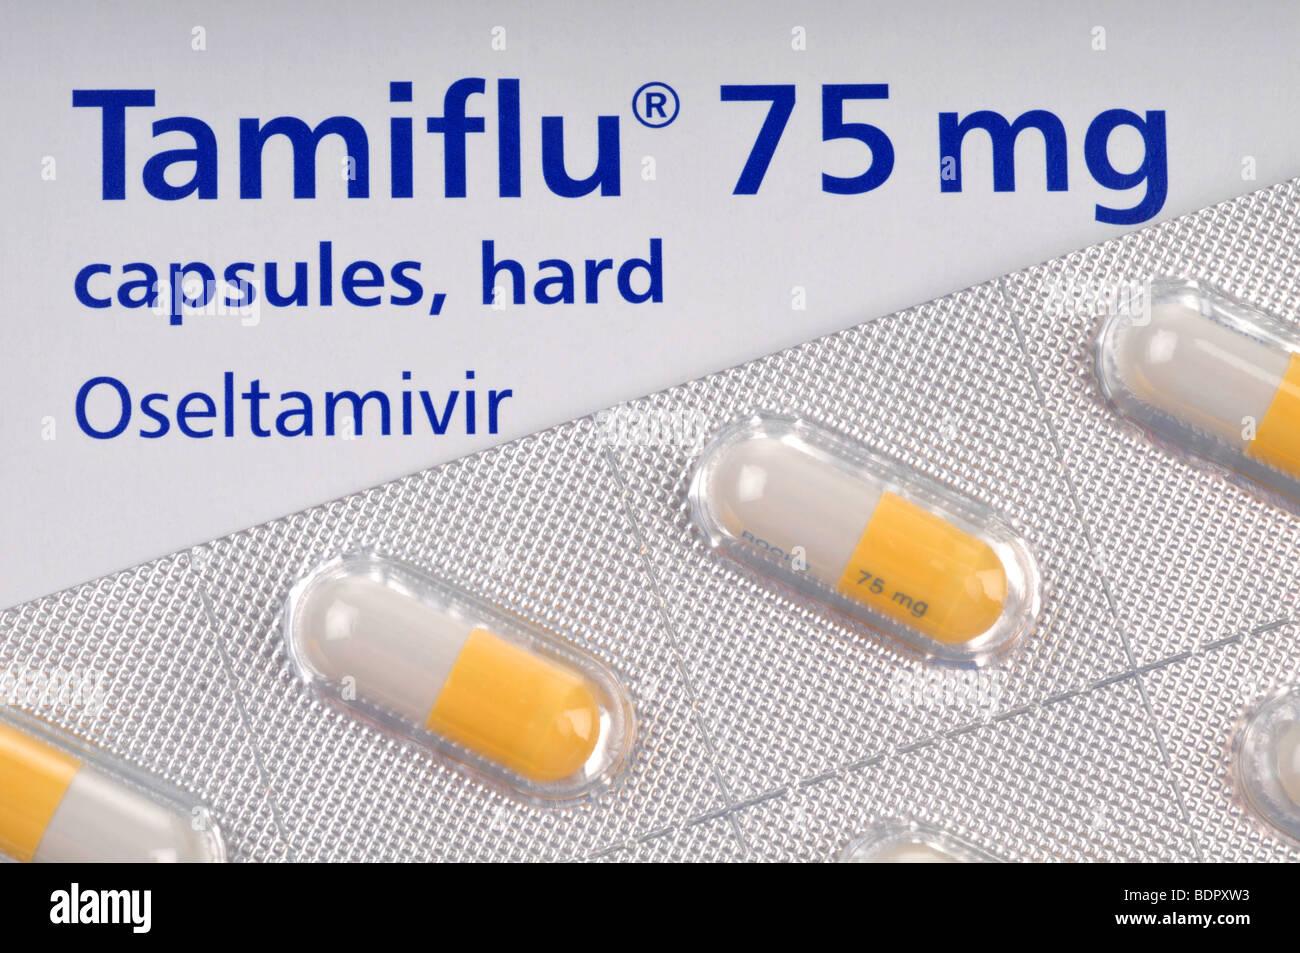 Treatment Of Flu With Tamiflu